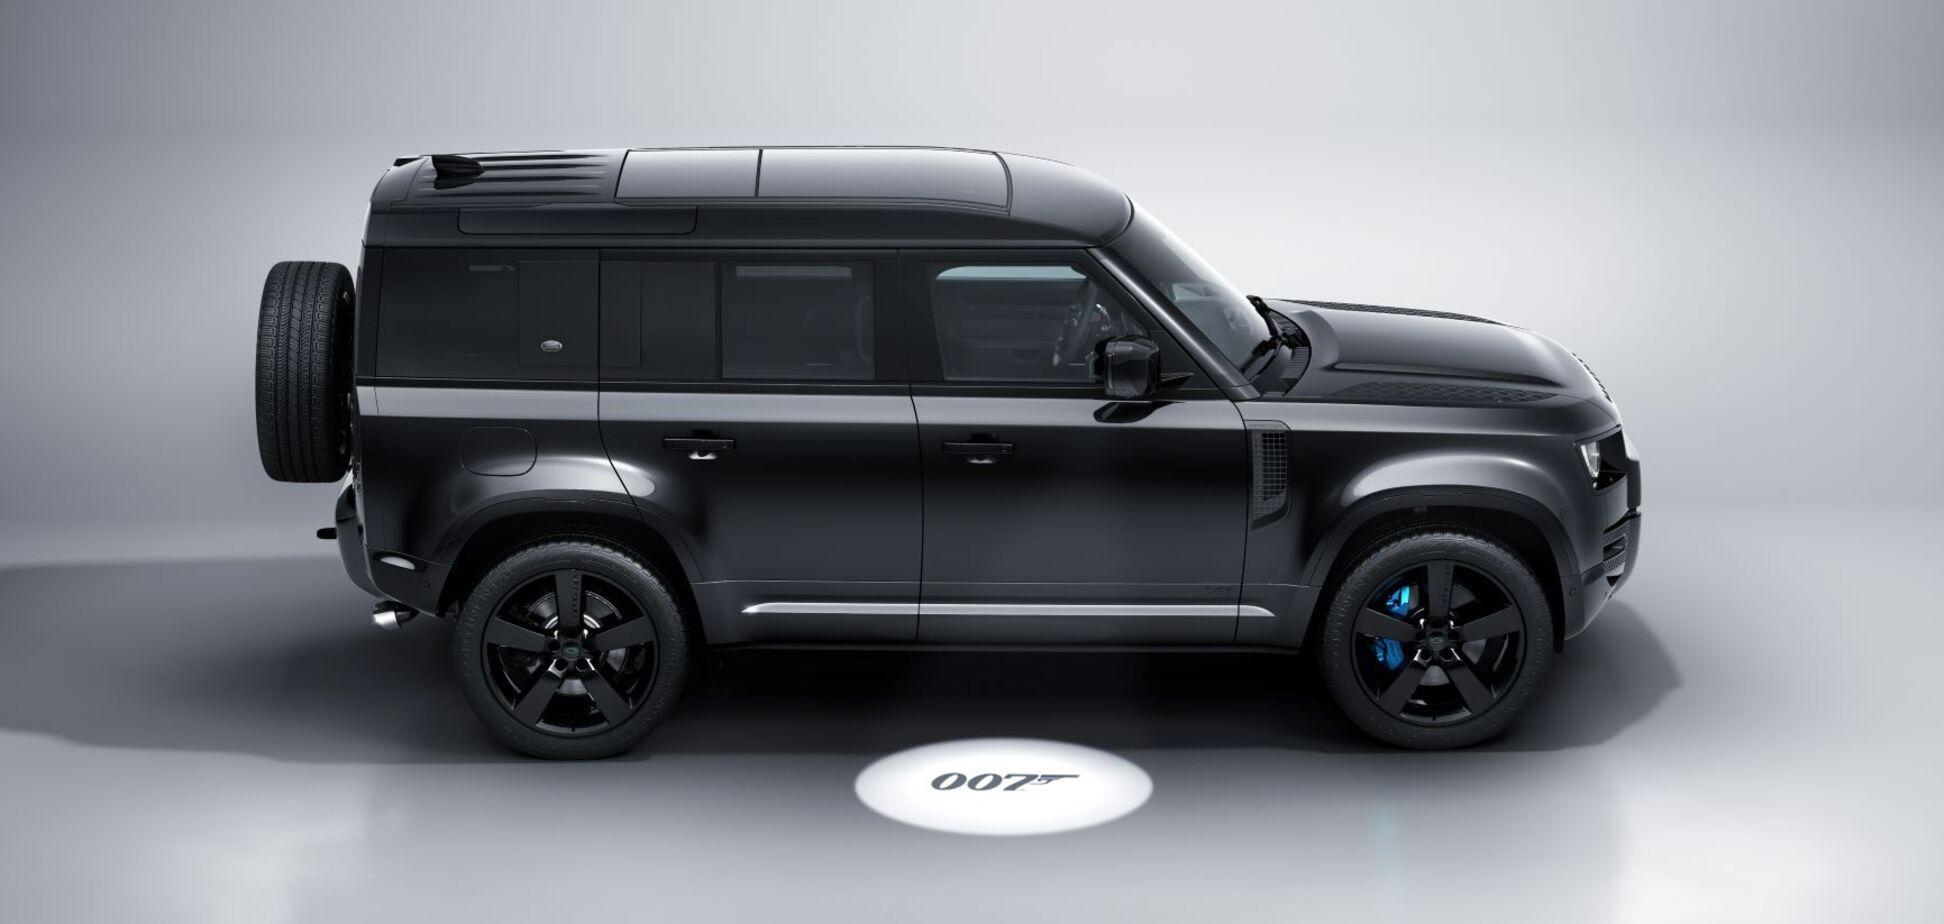 У сімействі Land Rover Defender з'явилася 'шпигунська' версія